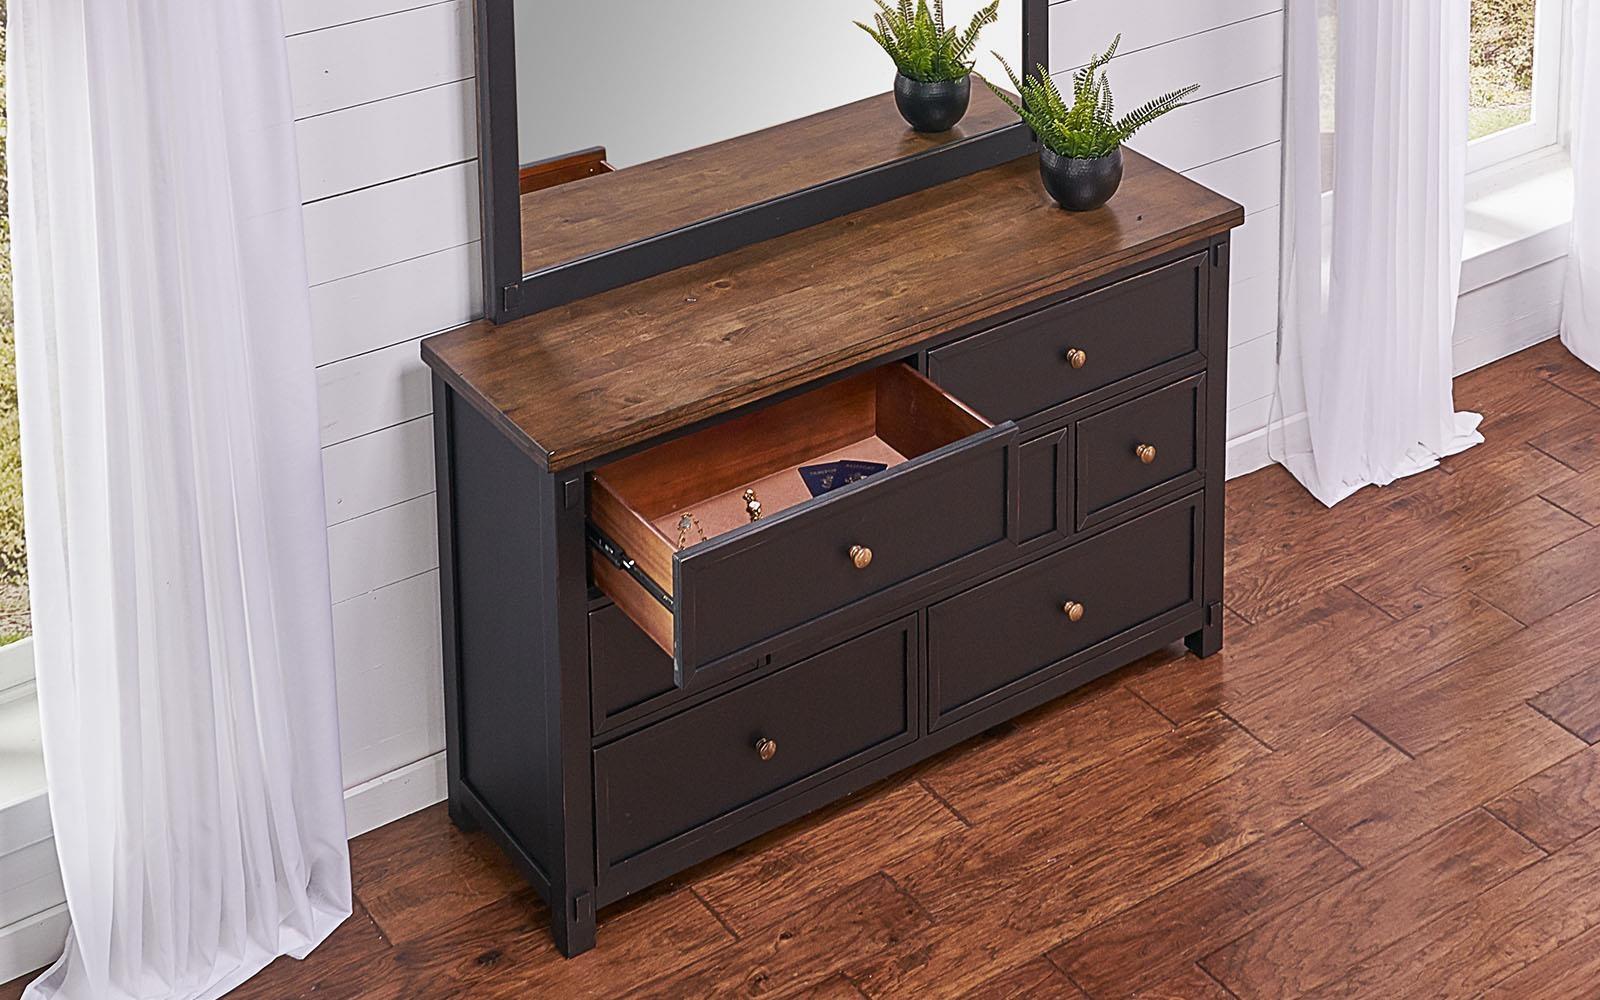 Stormy Ridge Dresser by AAmerica at VanDrie Home Furnishings